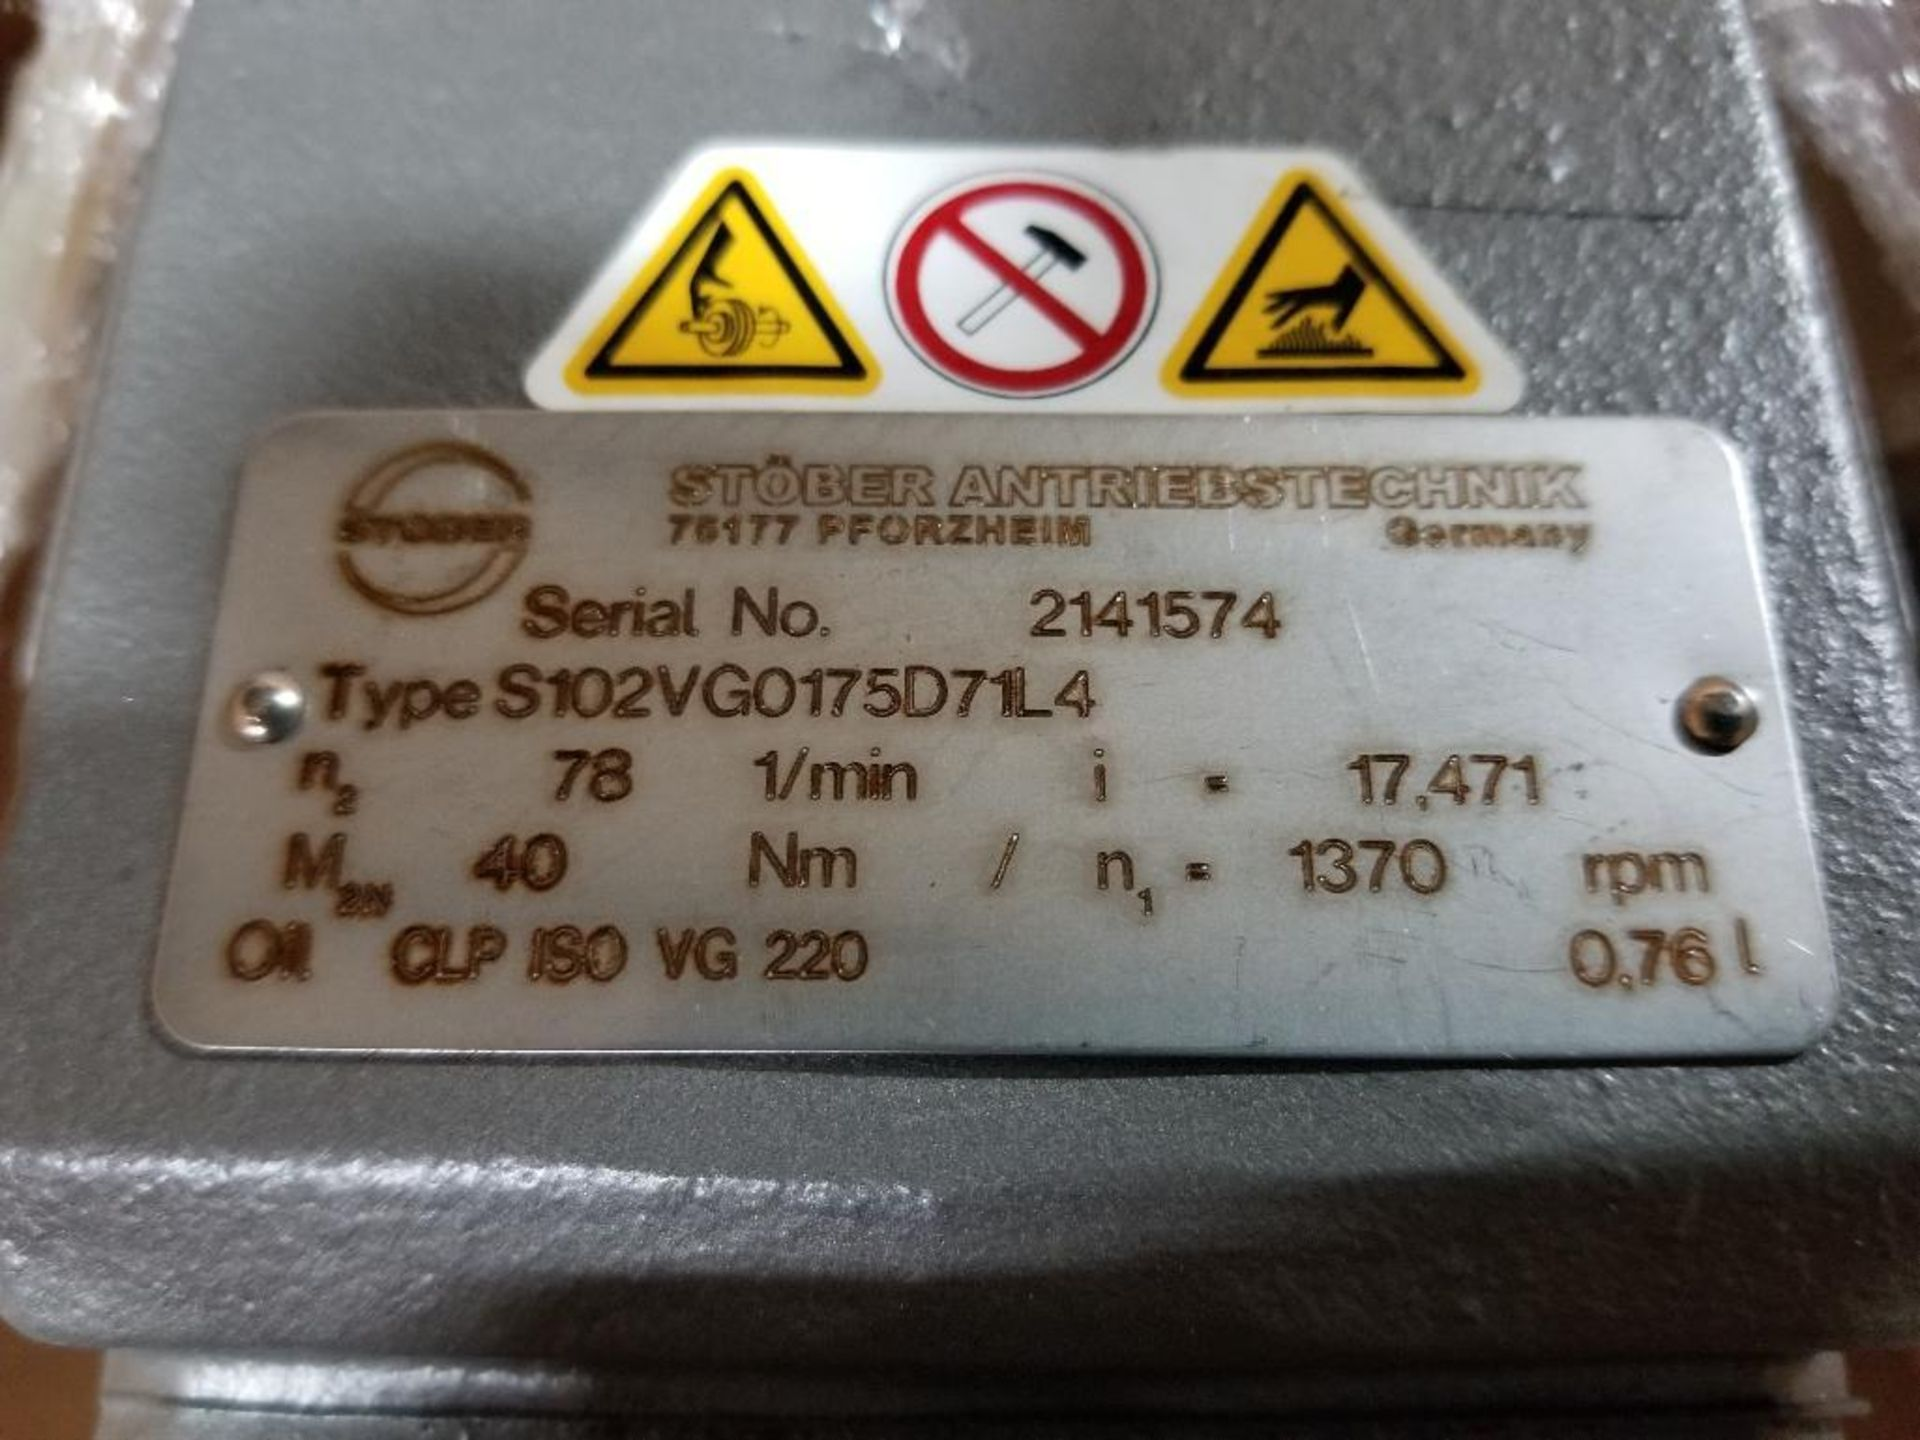 Stober S102VG0175D71L4 gear box. - Image 3 of 5